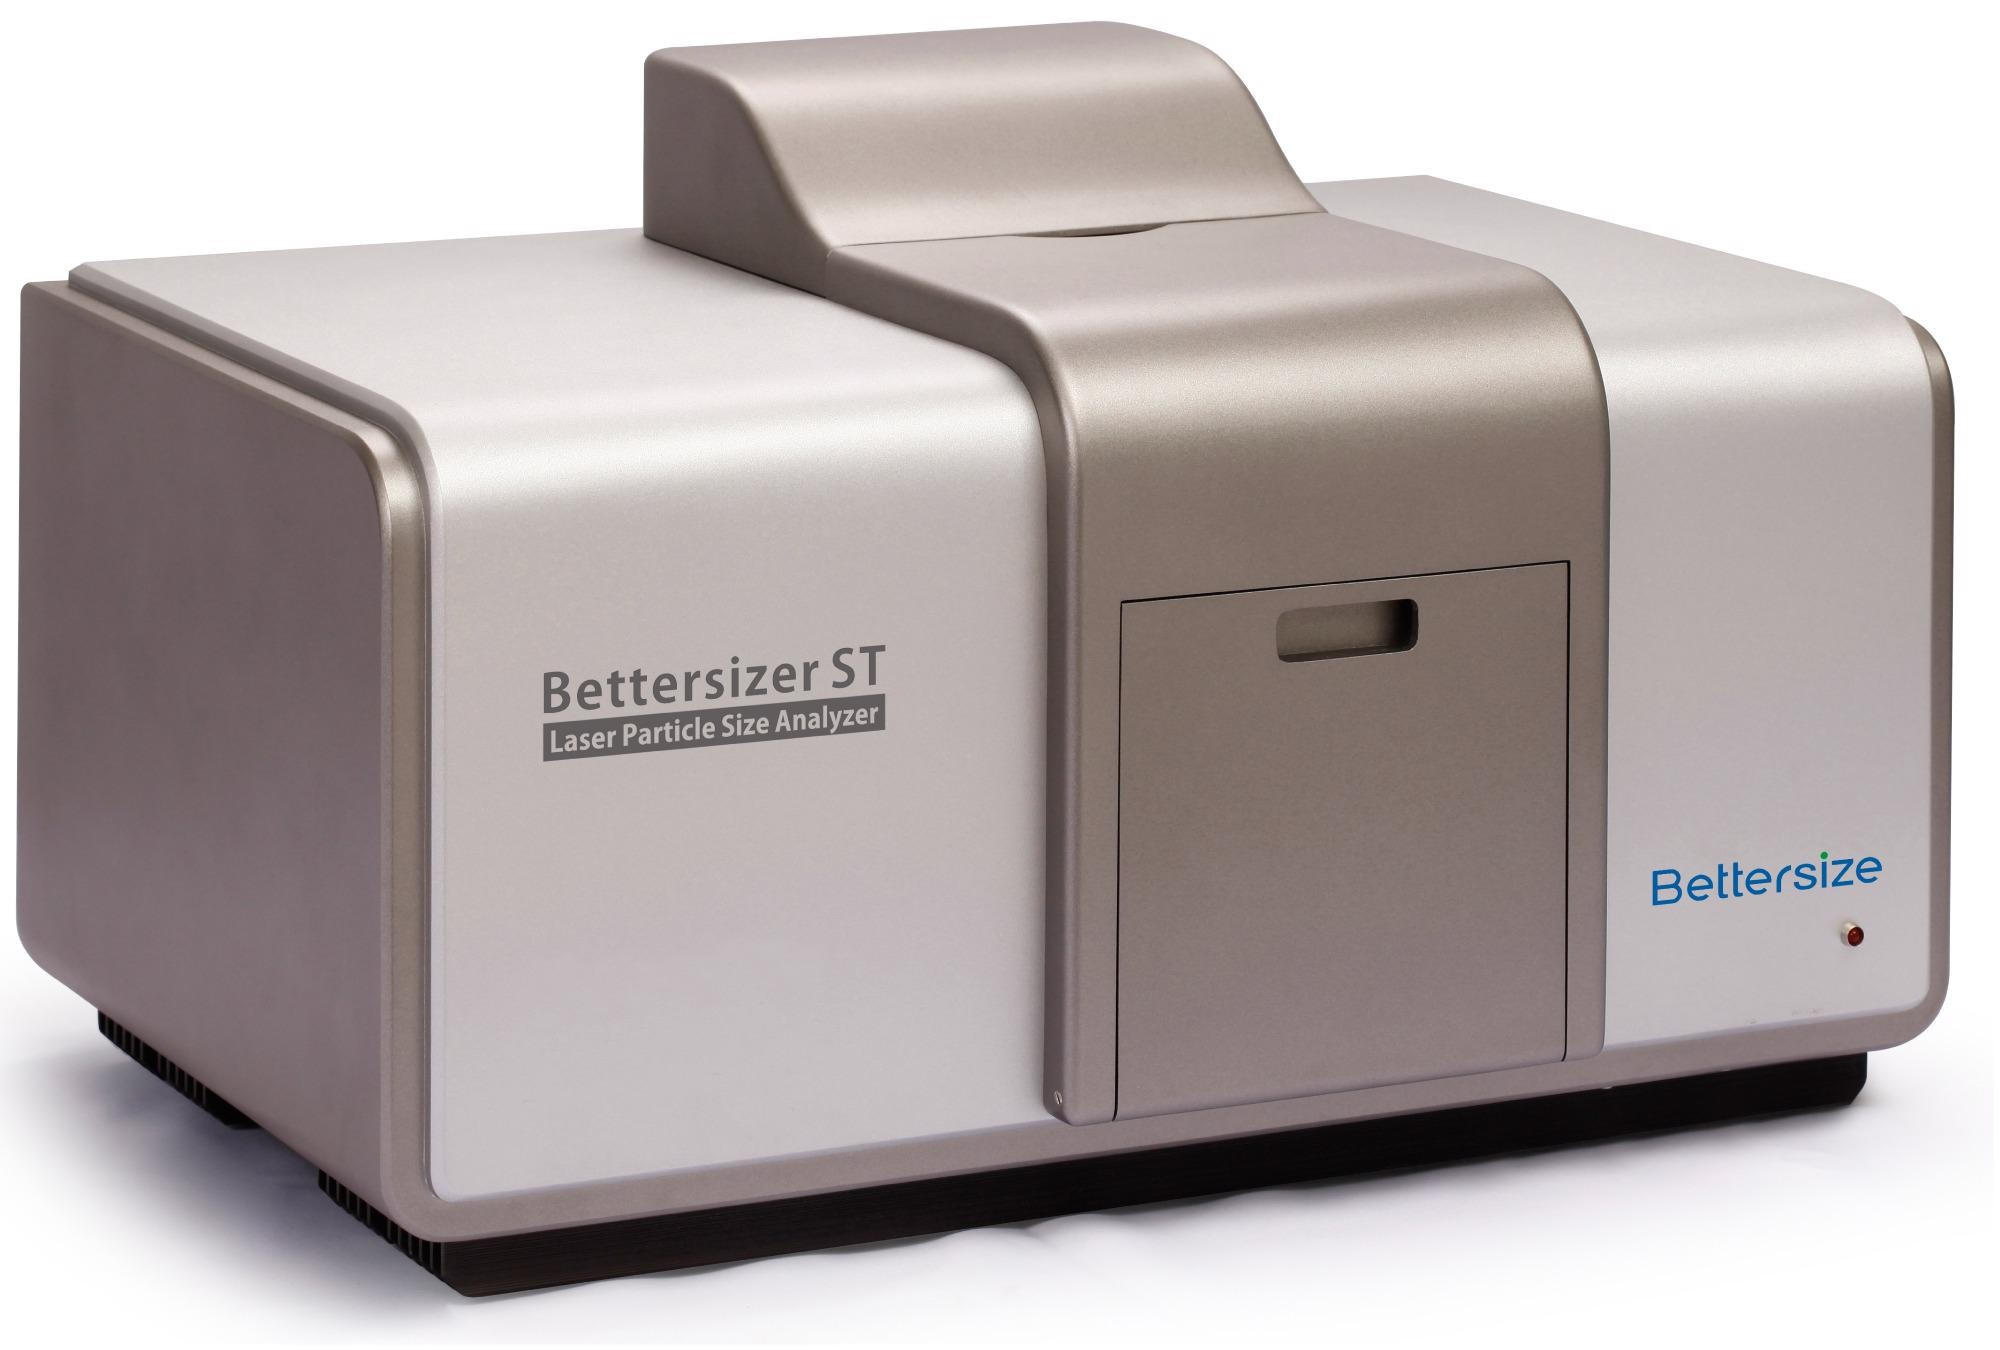 The Bettersizer ST Laser Particle Size Analyzer